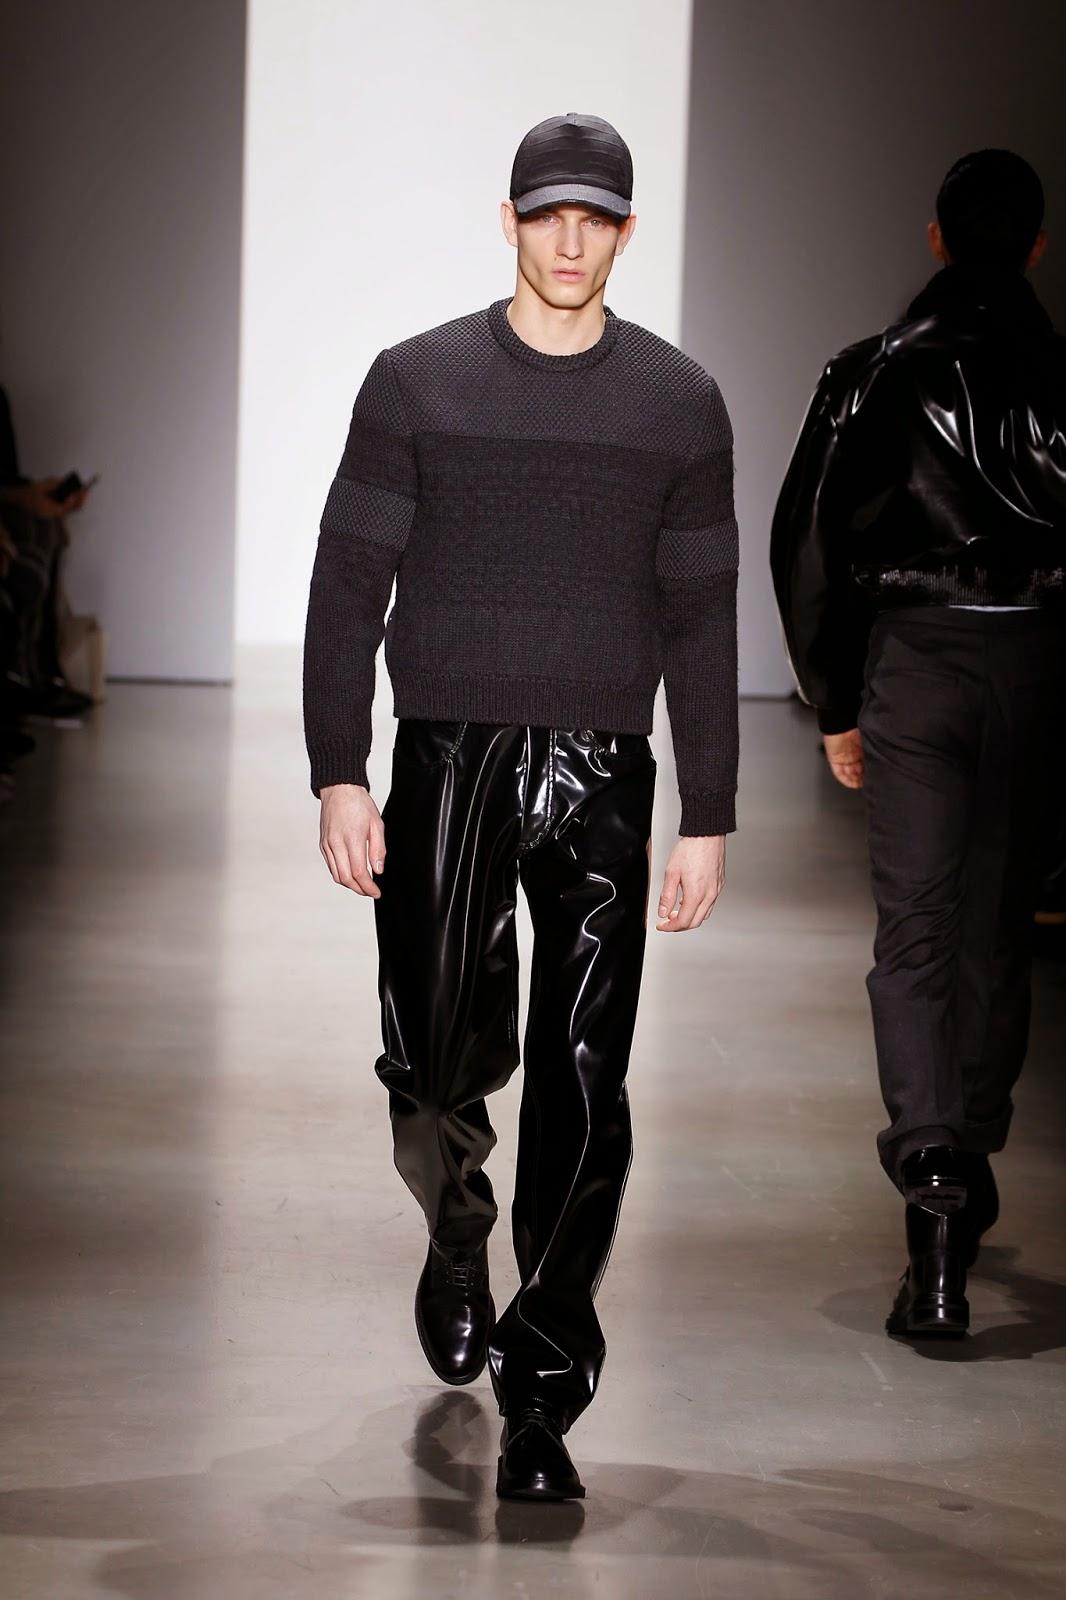 020f02bc6bc98 Conteúdo Masculino - Moda masculina   lifestyle  Calvin Klein ...